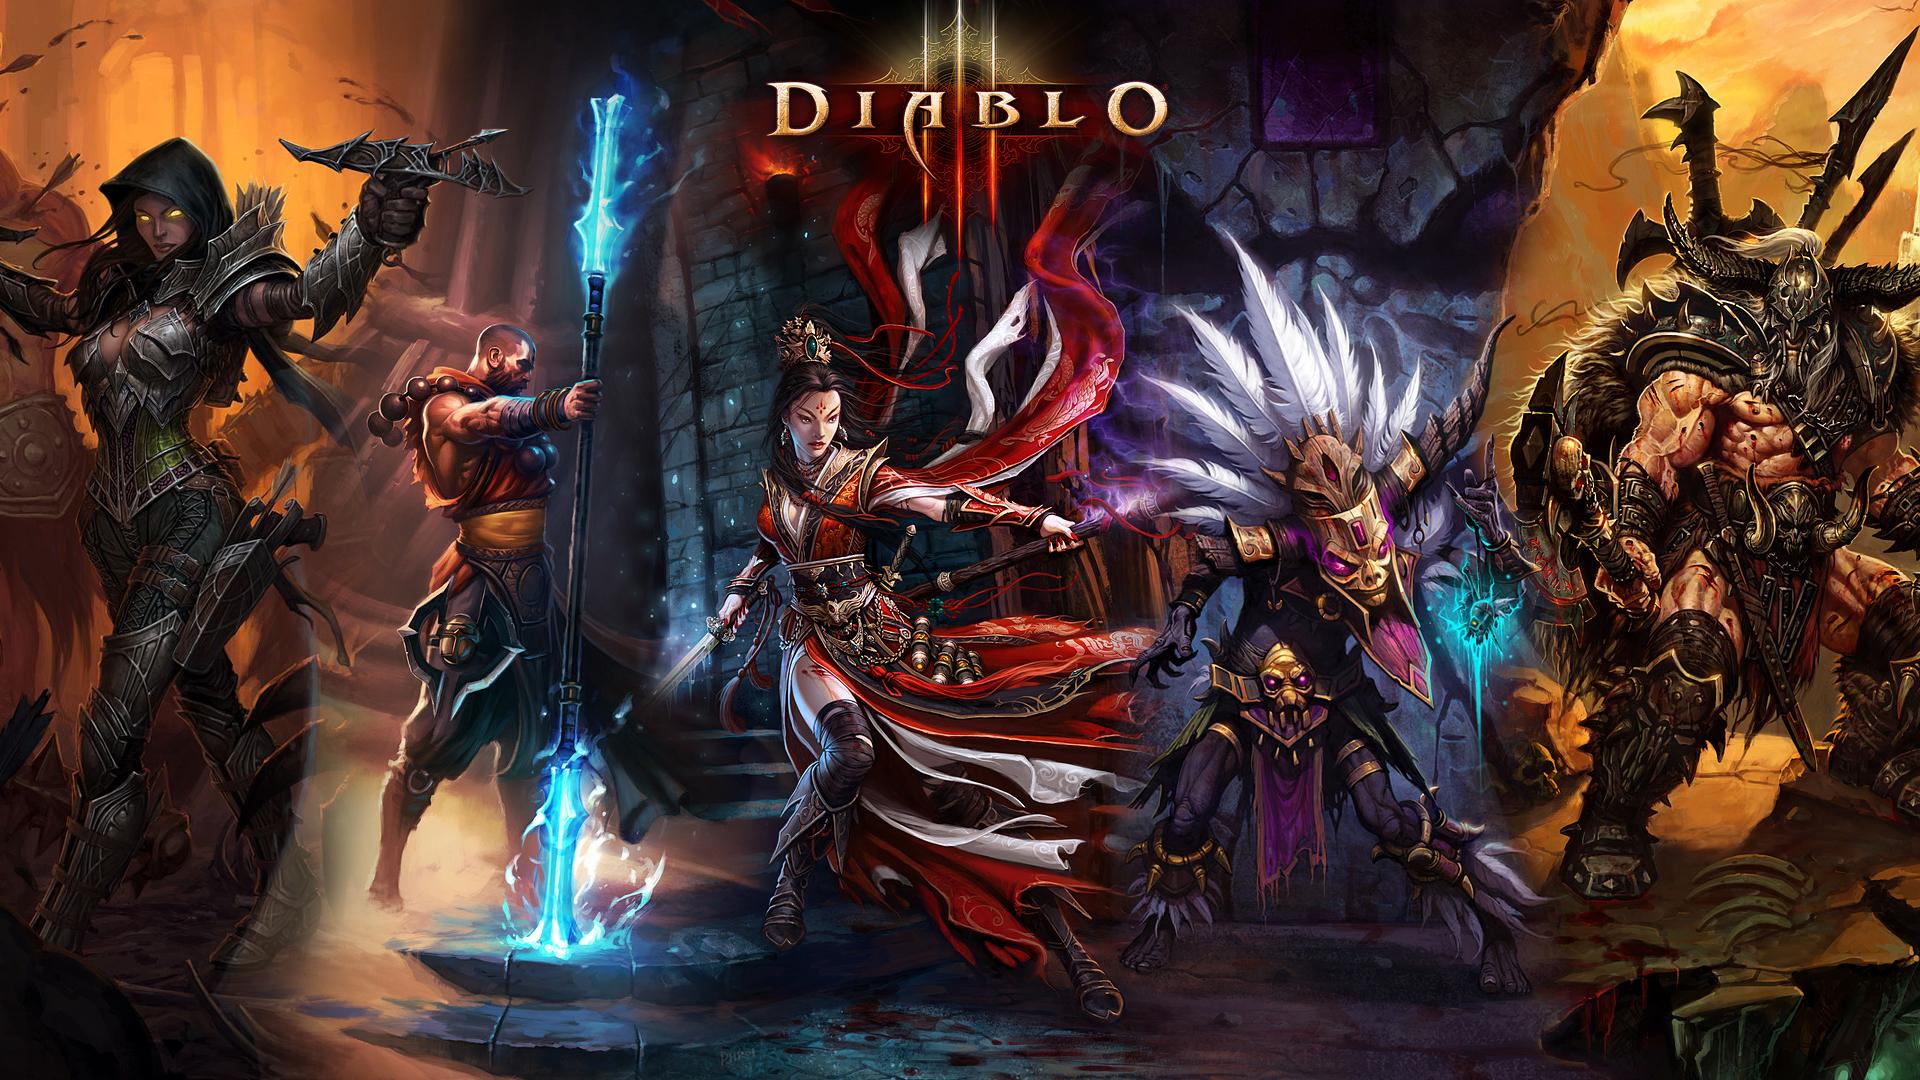 Diablo 3 Wallpaper 1920x1080: Diablo Animated Wallpaper